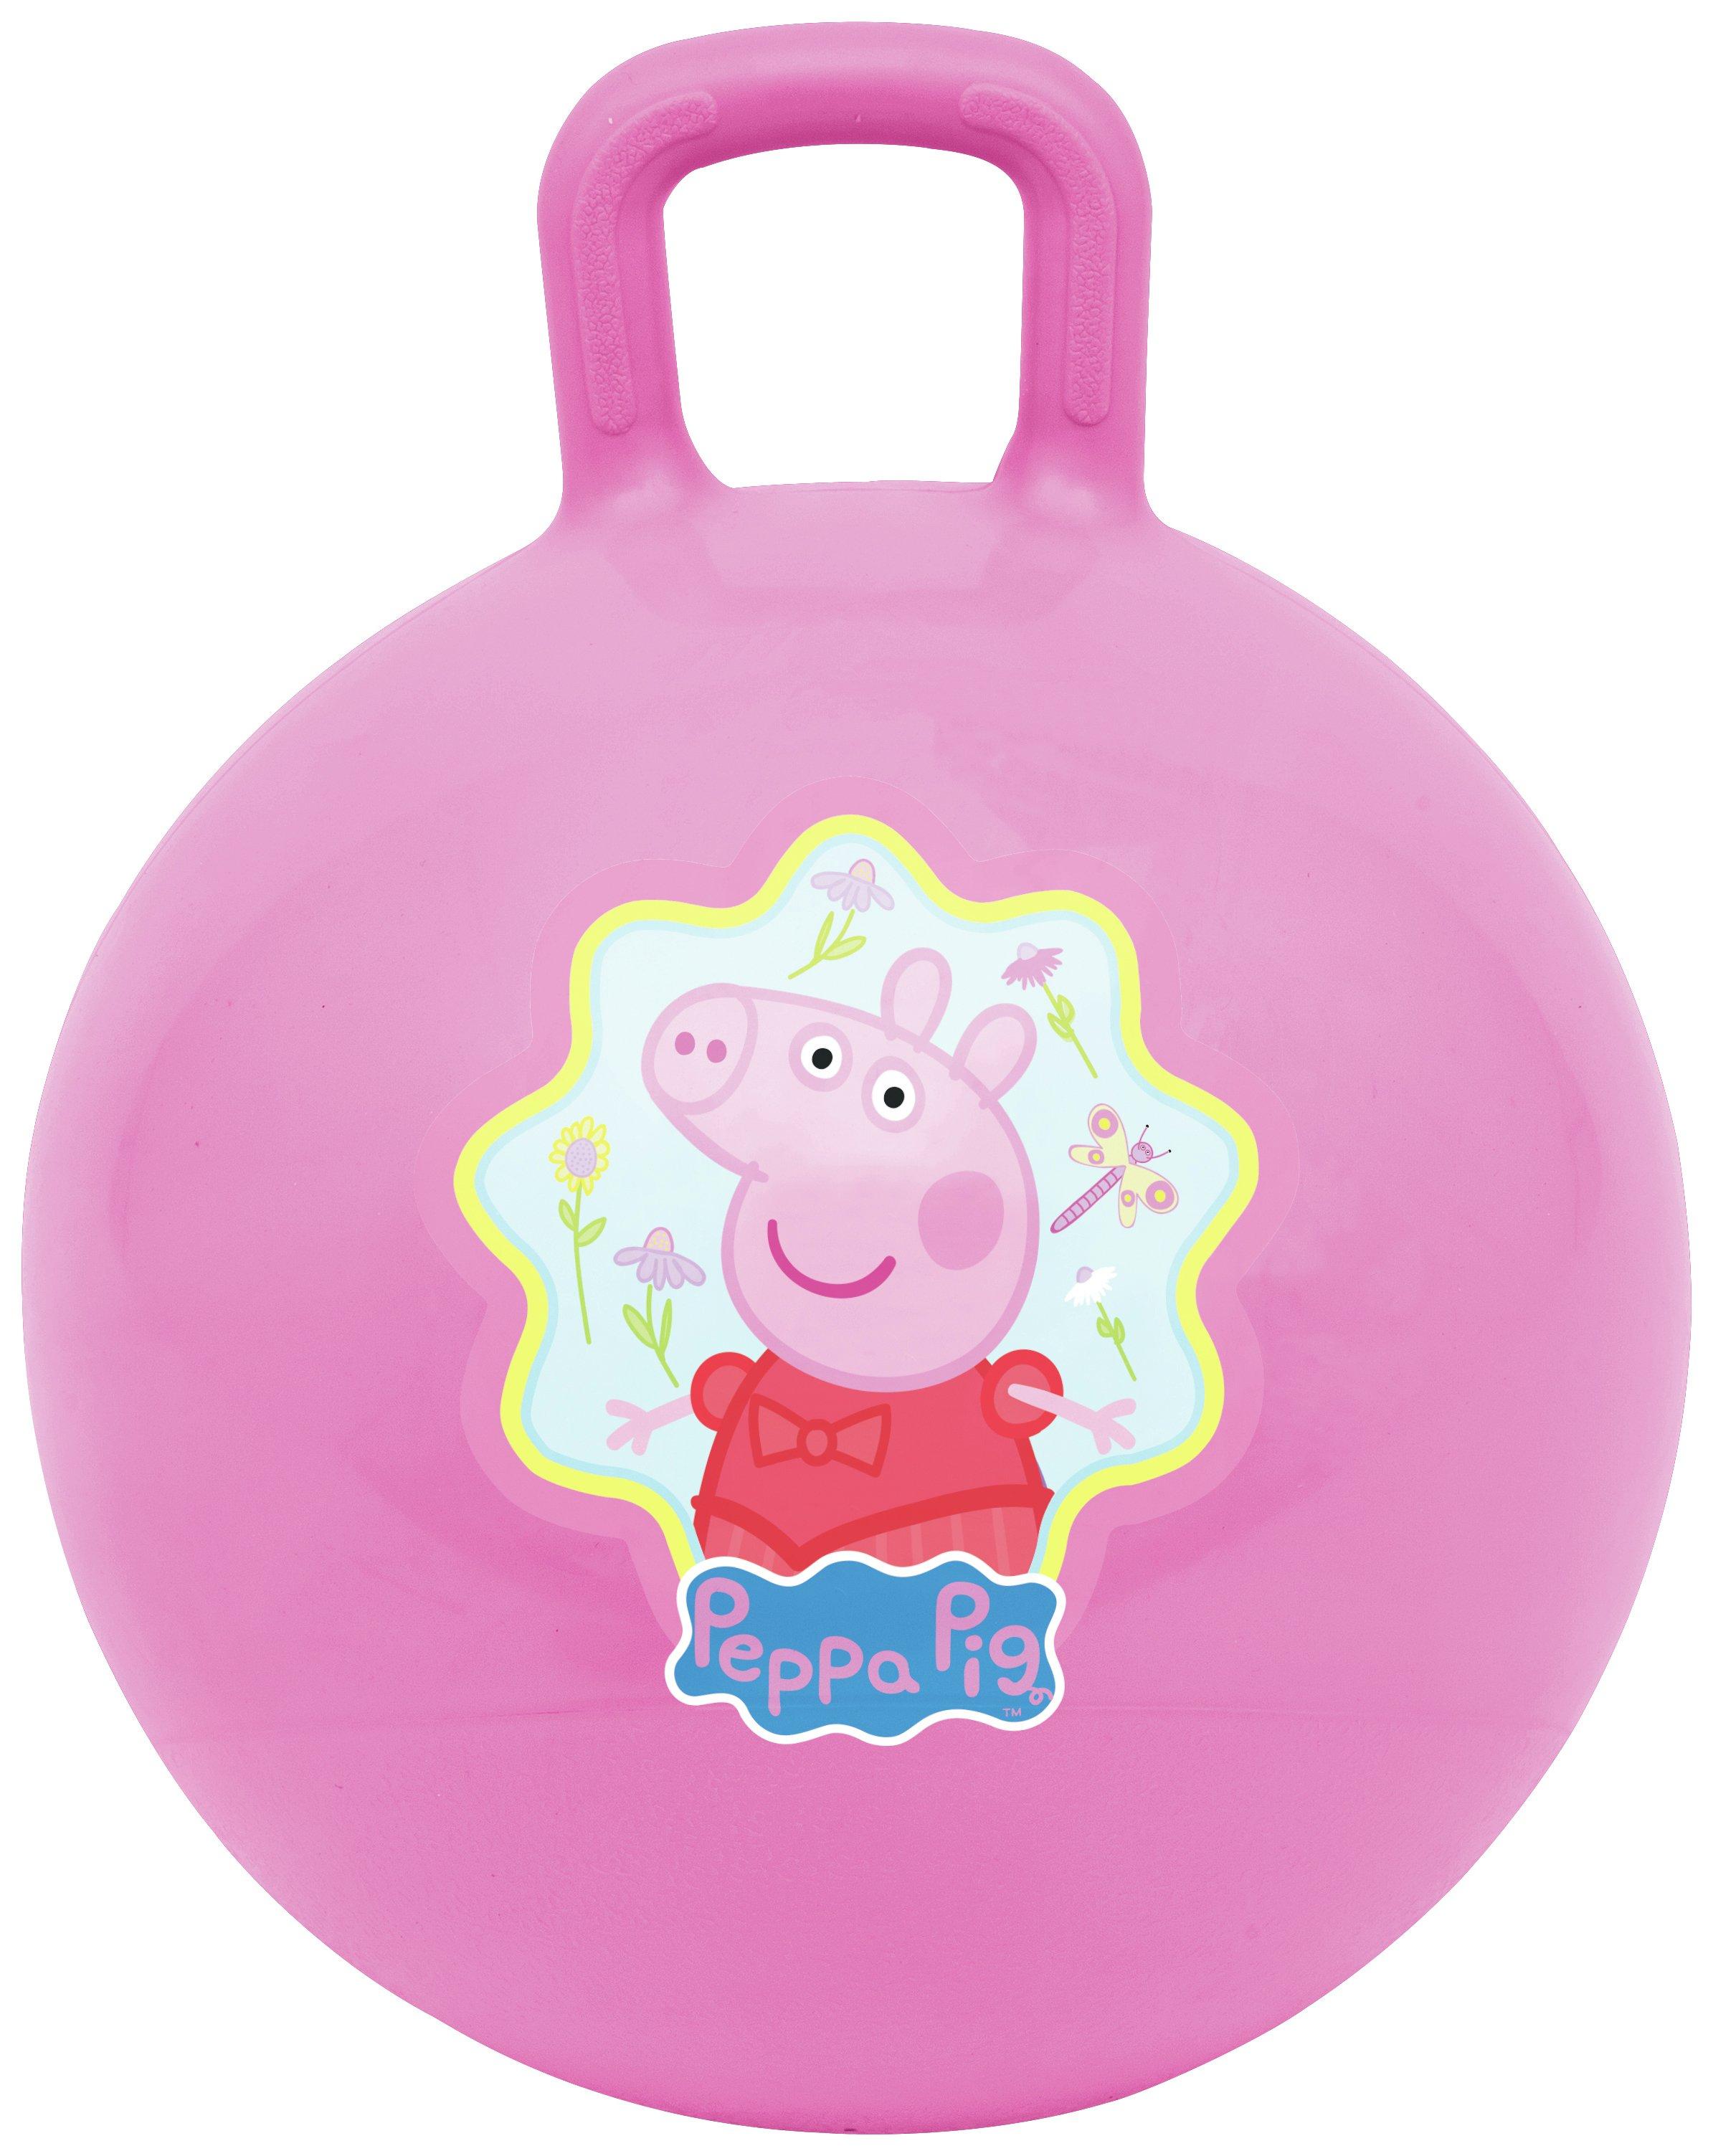 Peppa Pig Space Hopper.